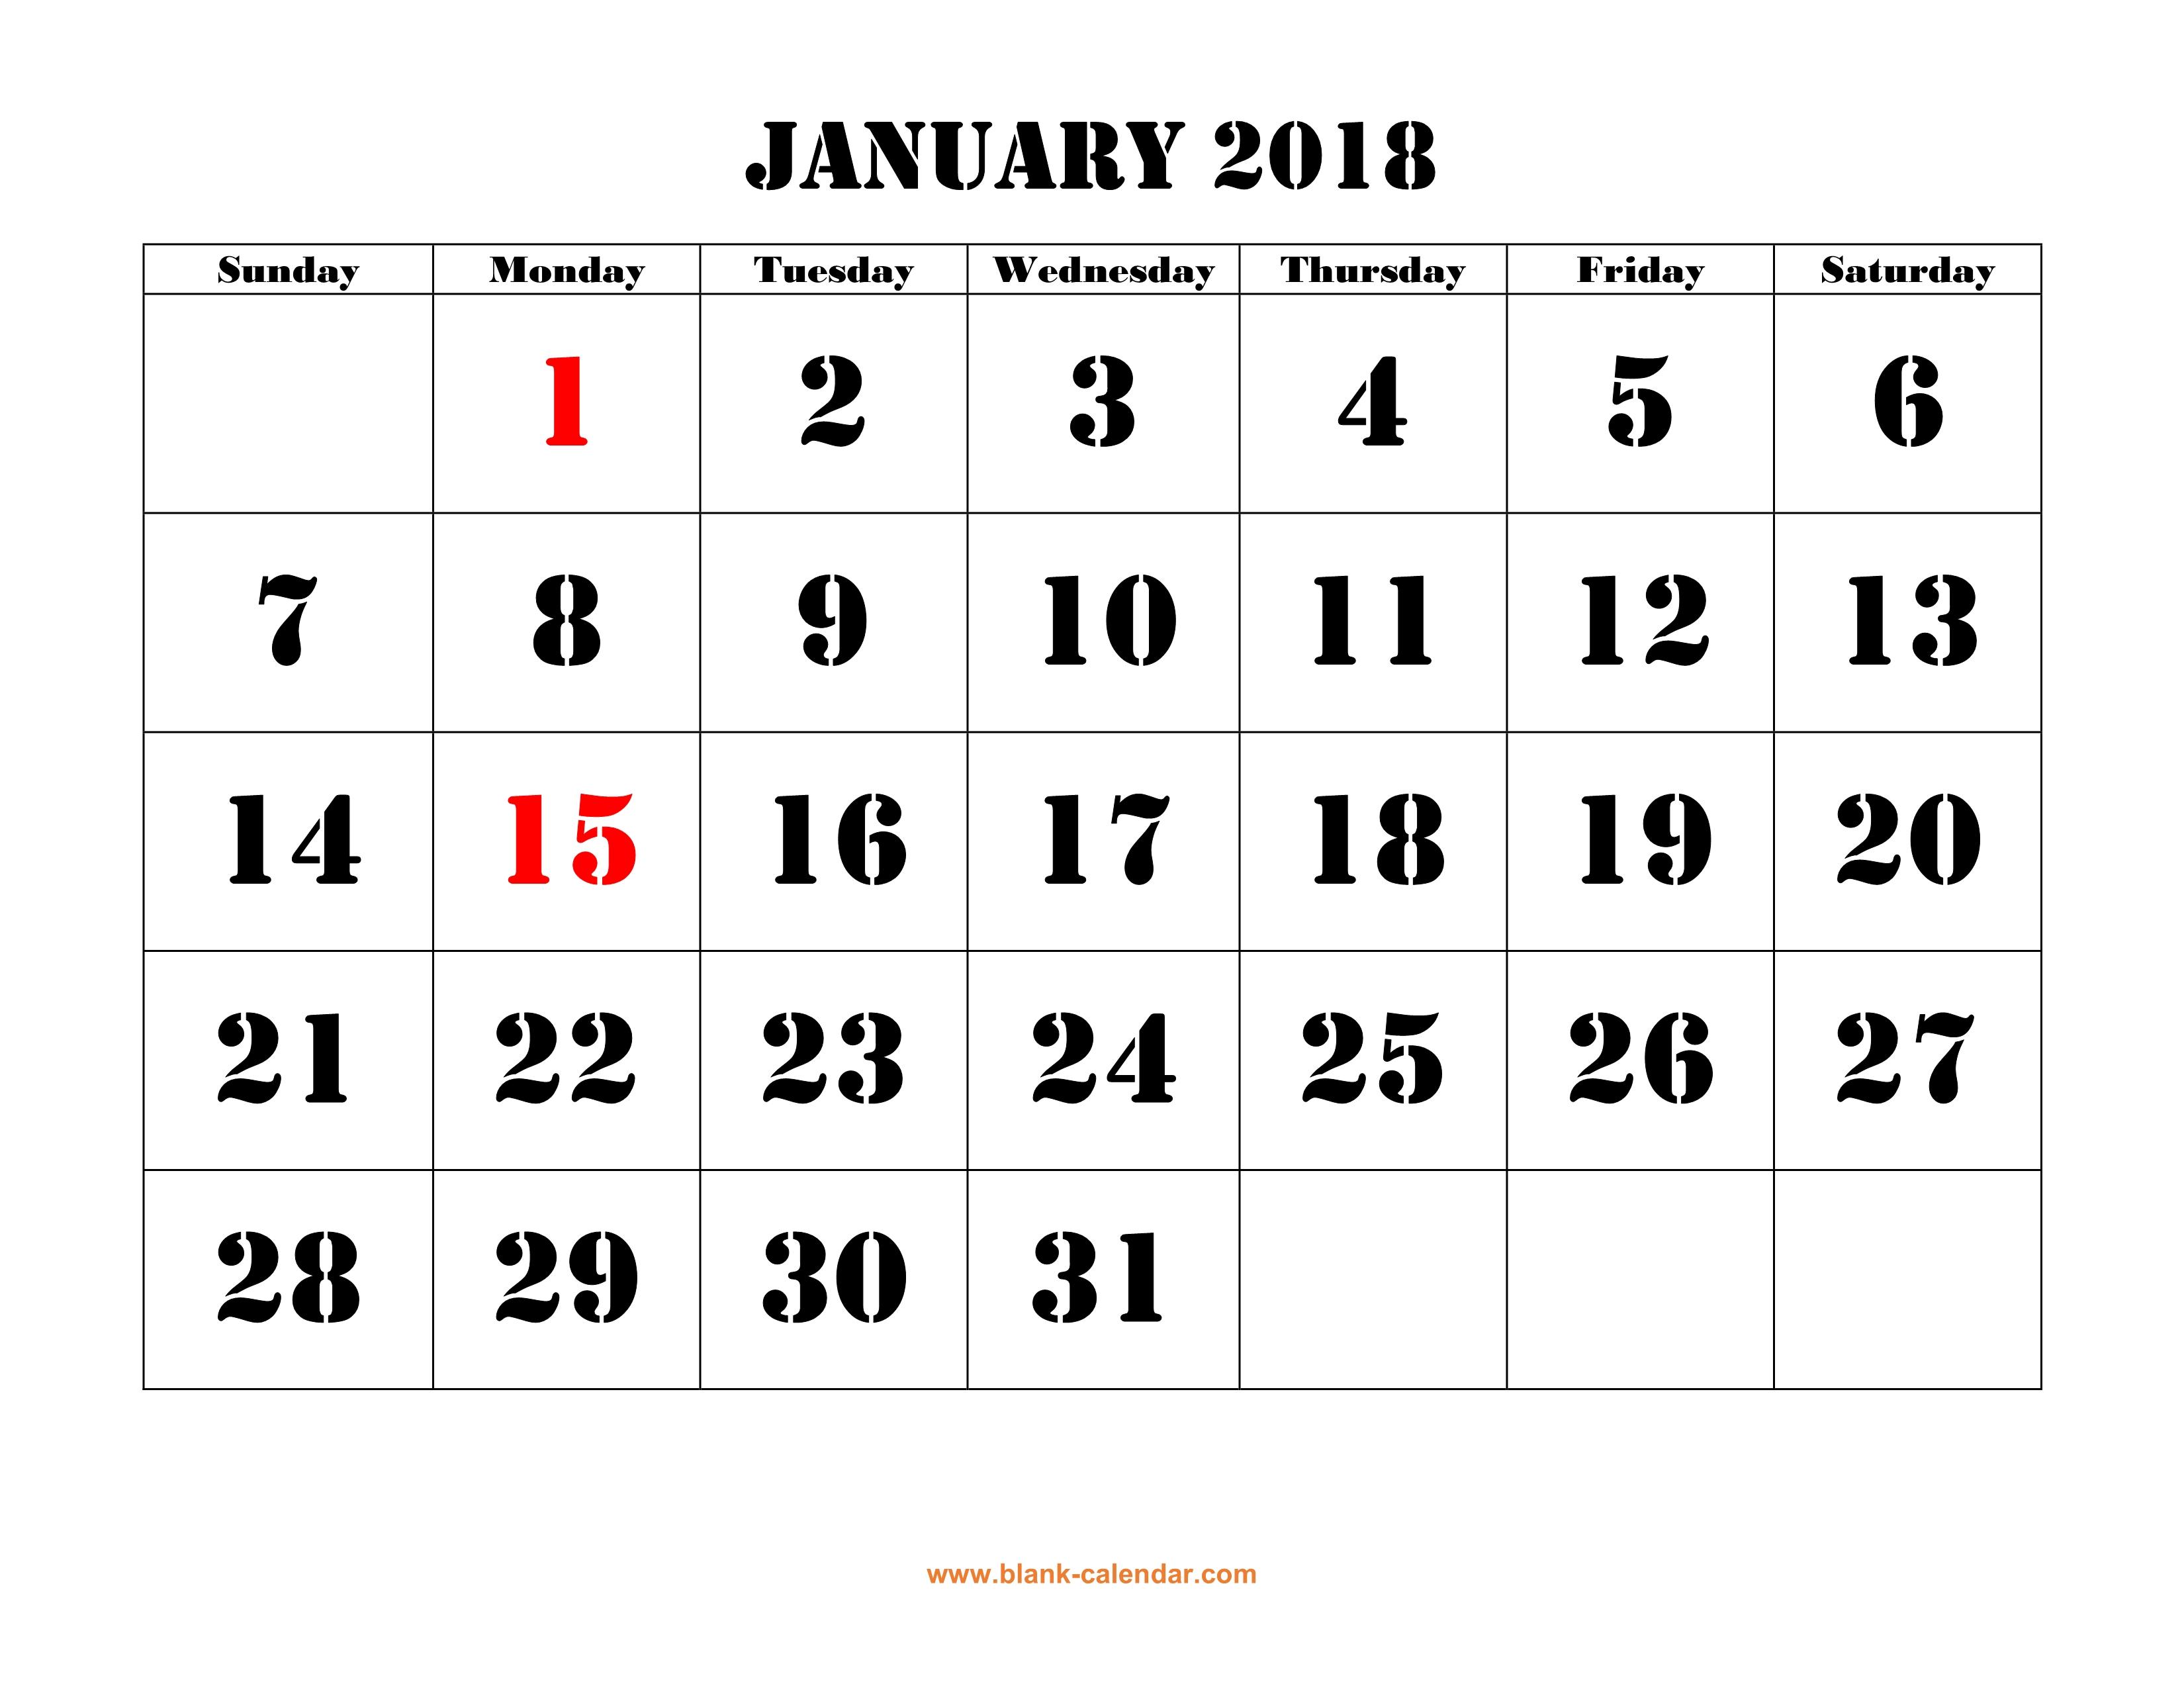 Printable Calendar 2018 | Free Download Yearly Calendar Templates pertaining to Blank Writable Calendar Template Large December Calendar Com